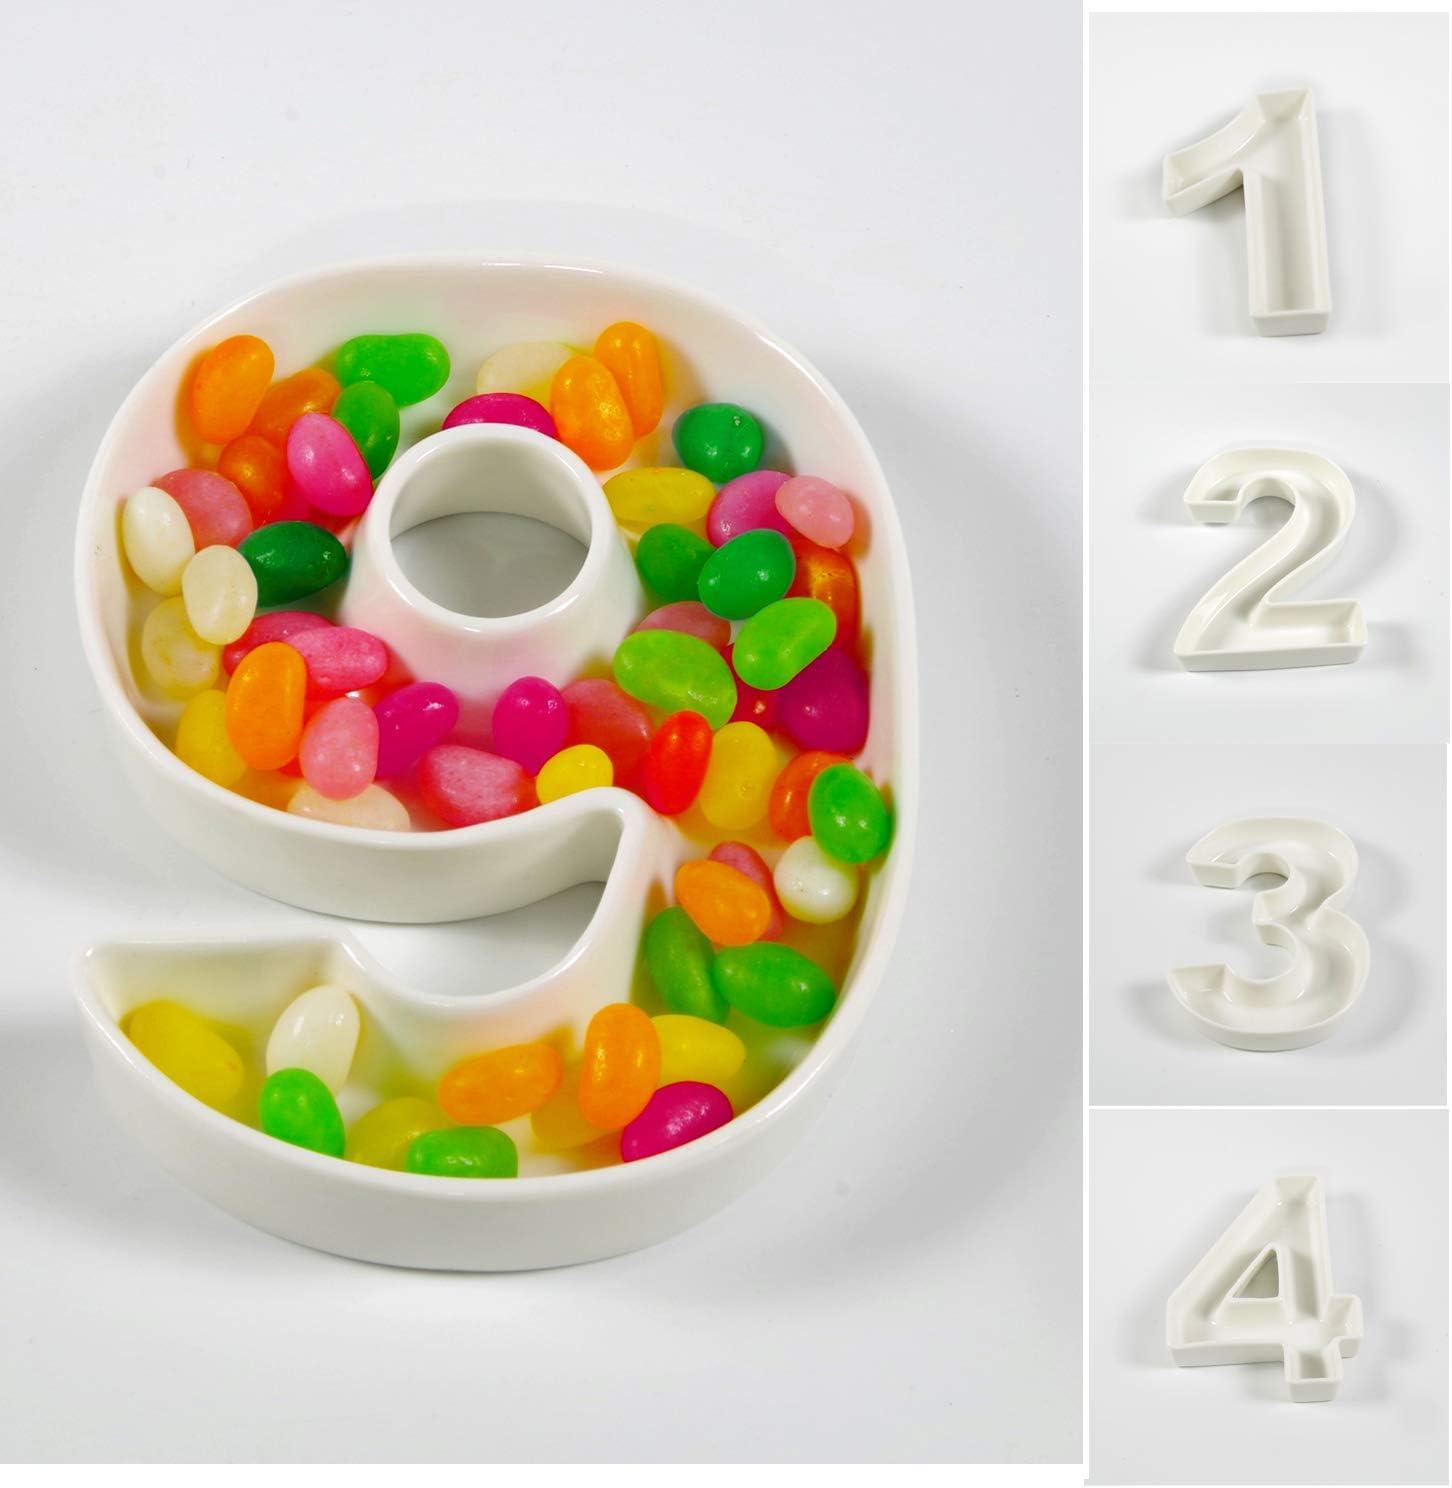 Amazon.com: gifttes blanco número de cerámica plato para ...